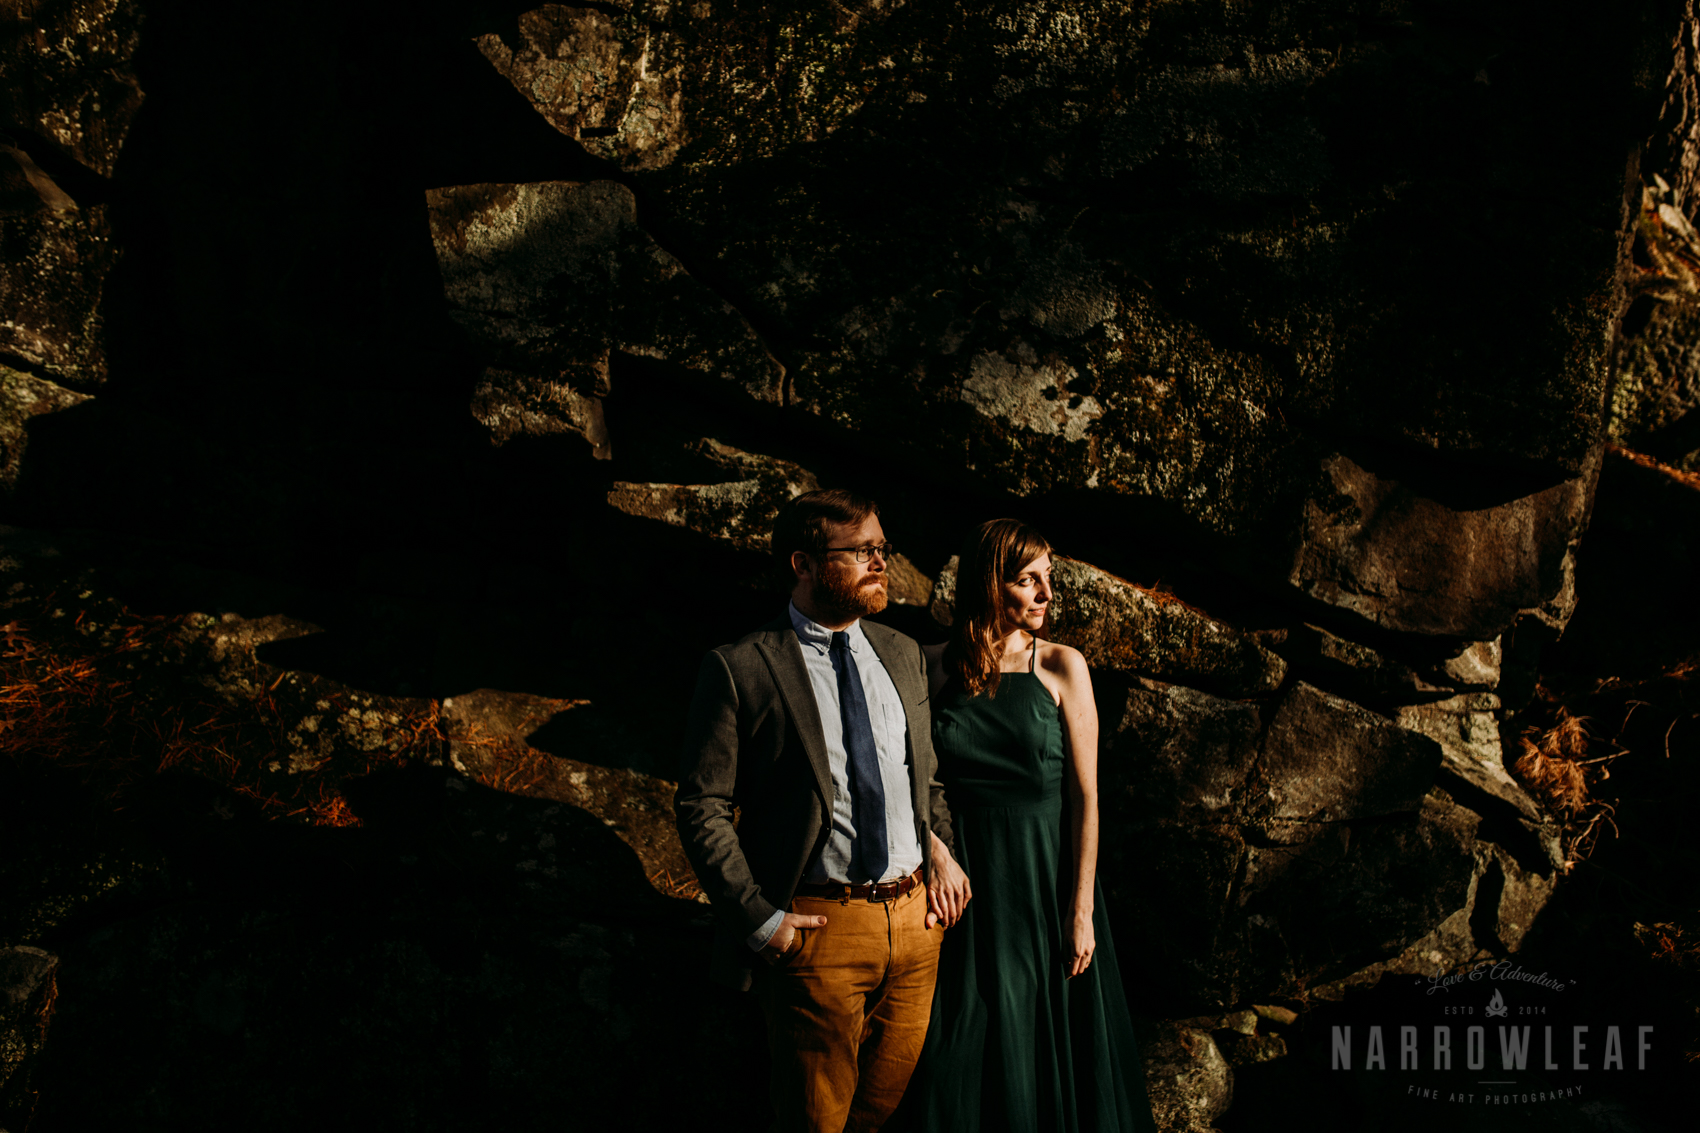 Spring-moody-wisconsin-woodsy-elopement-NarrowLeaf_Love_&_Adventure_Photography-9639.jpg